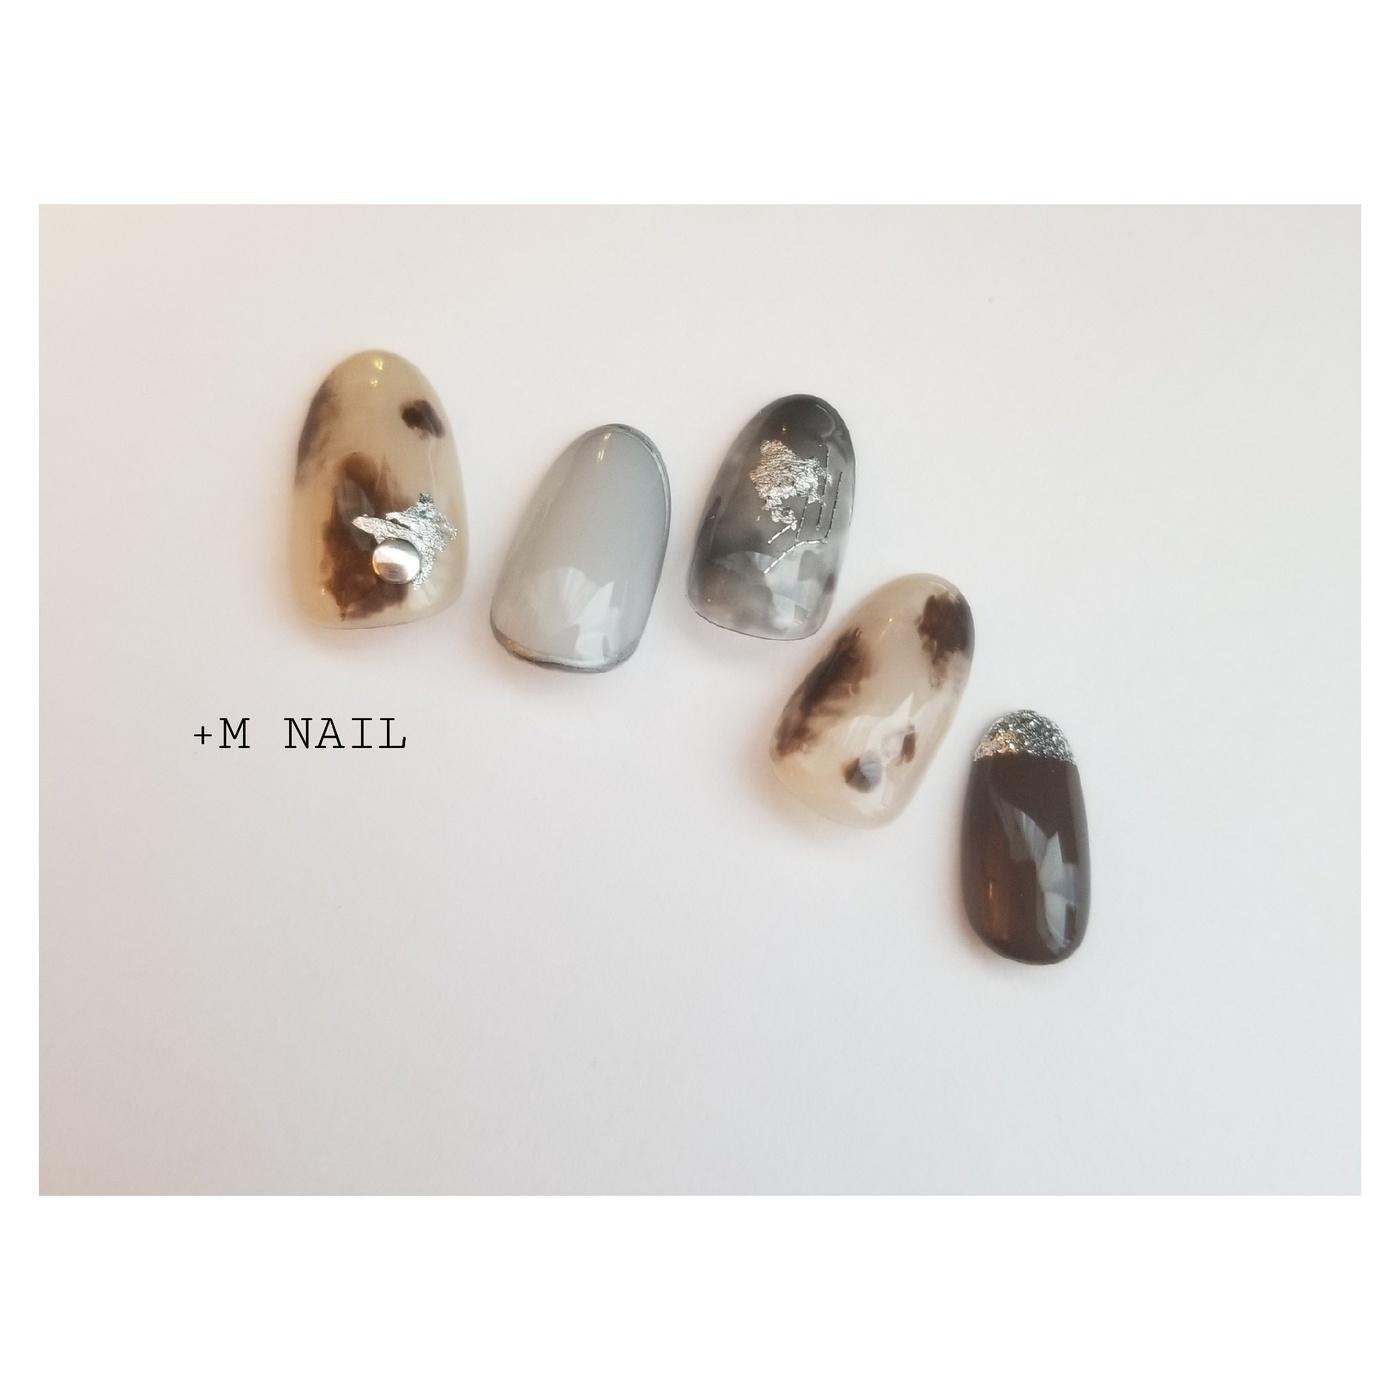 #nails #ジェル #ジェルネイル #ネイル #ネイルサロン #ネイルデザイン #ハンド #大人ネイル #大人可愛い #ニュアンスネイル #白べっこう #グレイッシュ #スモーキーネイル #おしゃれネイル #カジュアルネイル